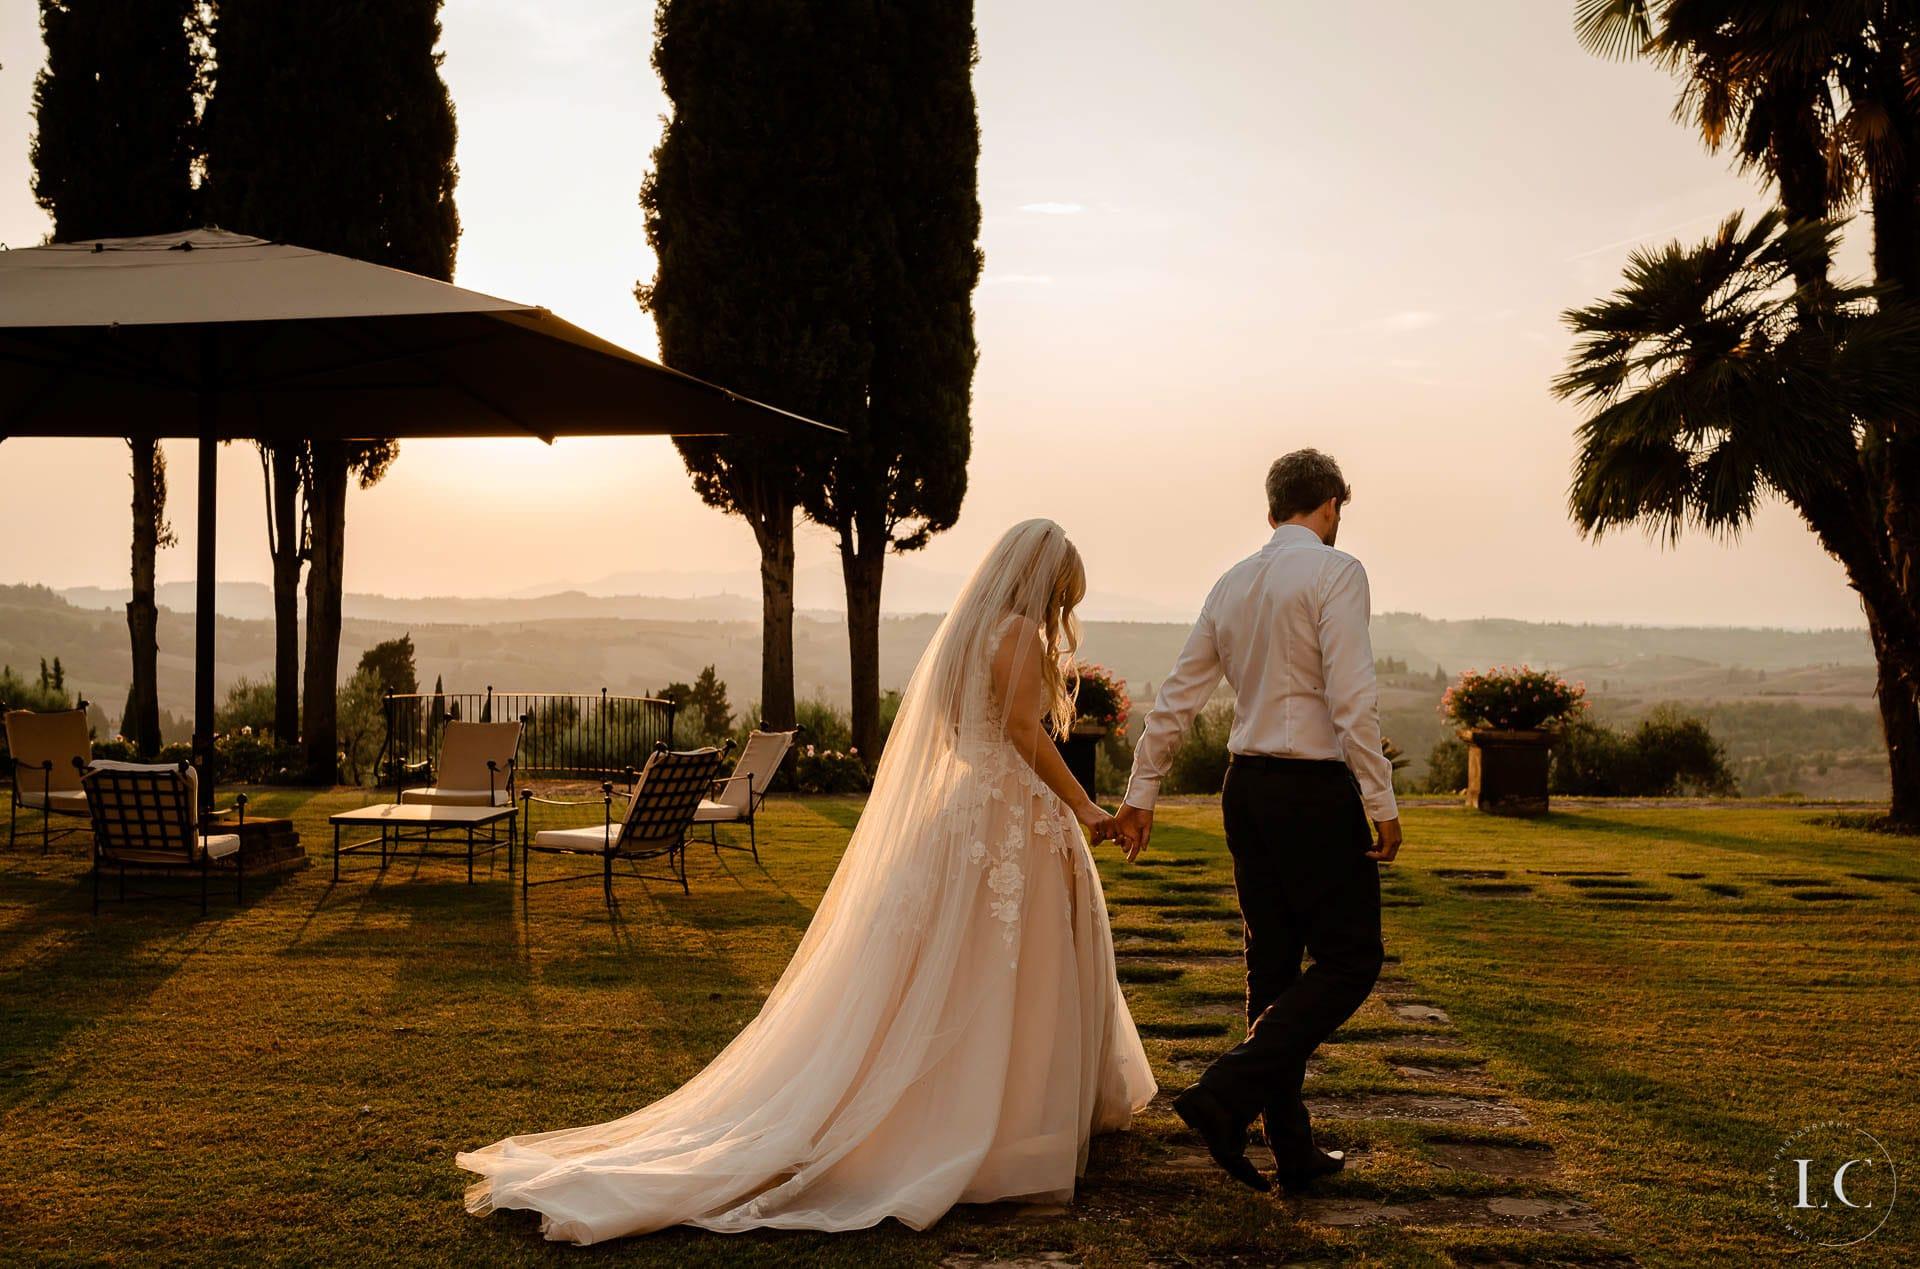 Newly weds walking outside at sunset